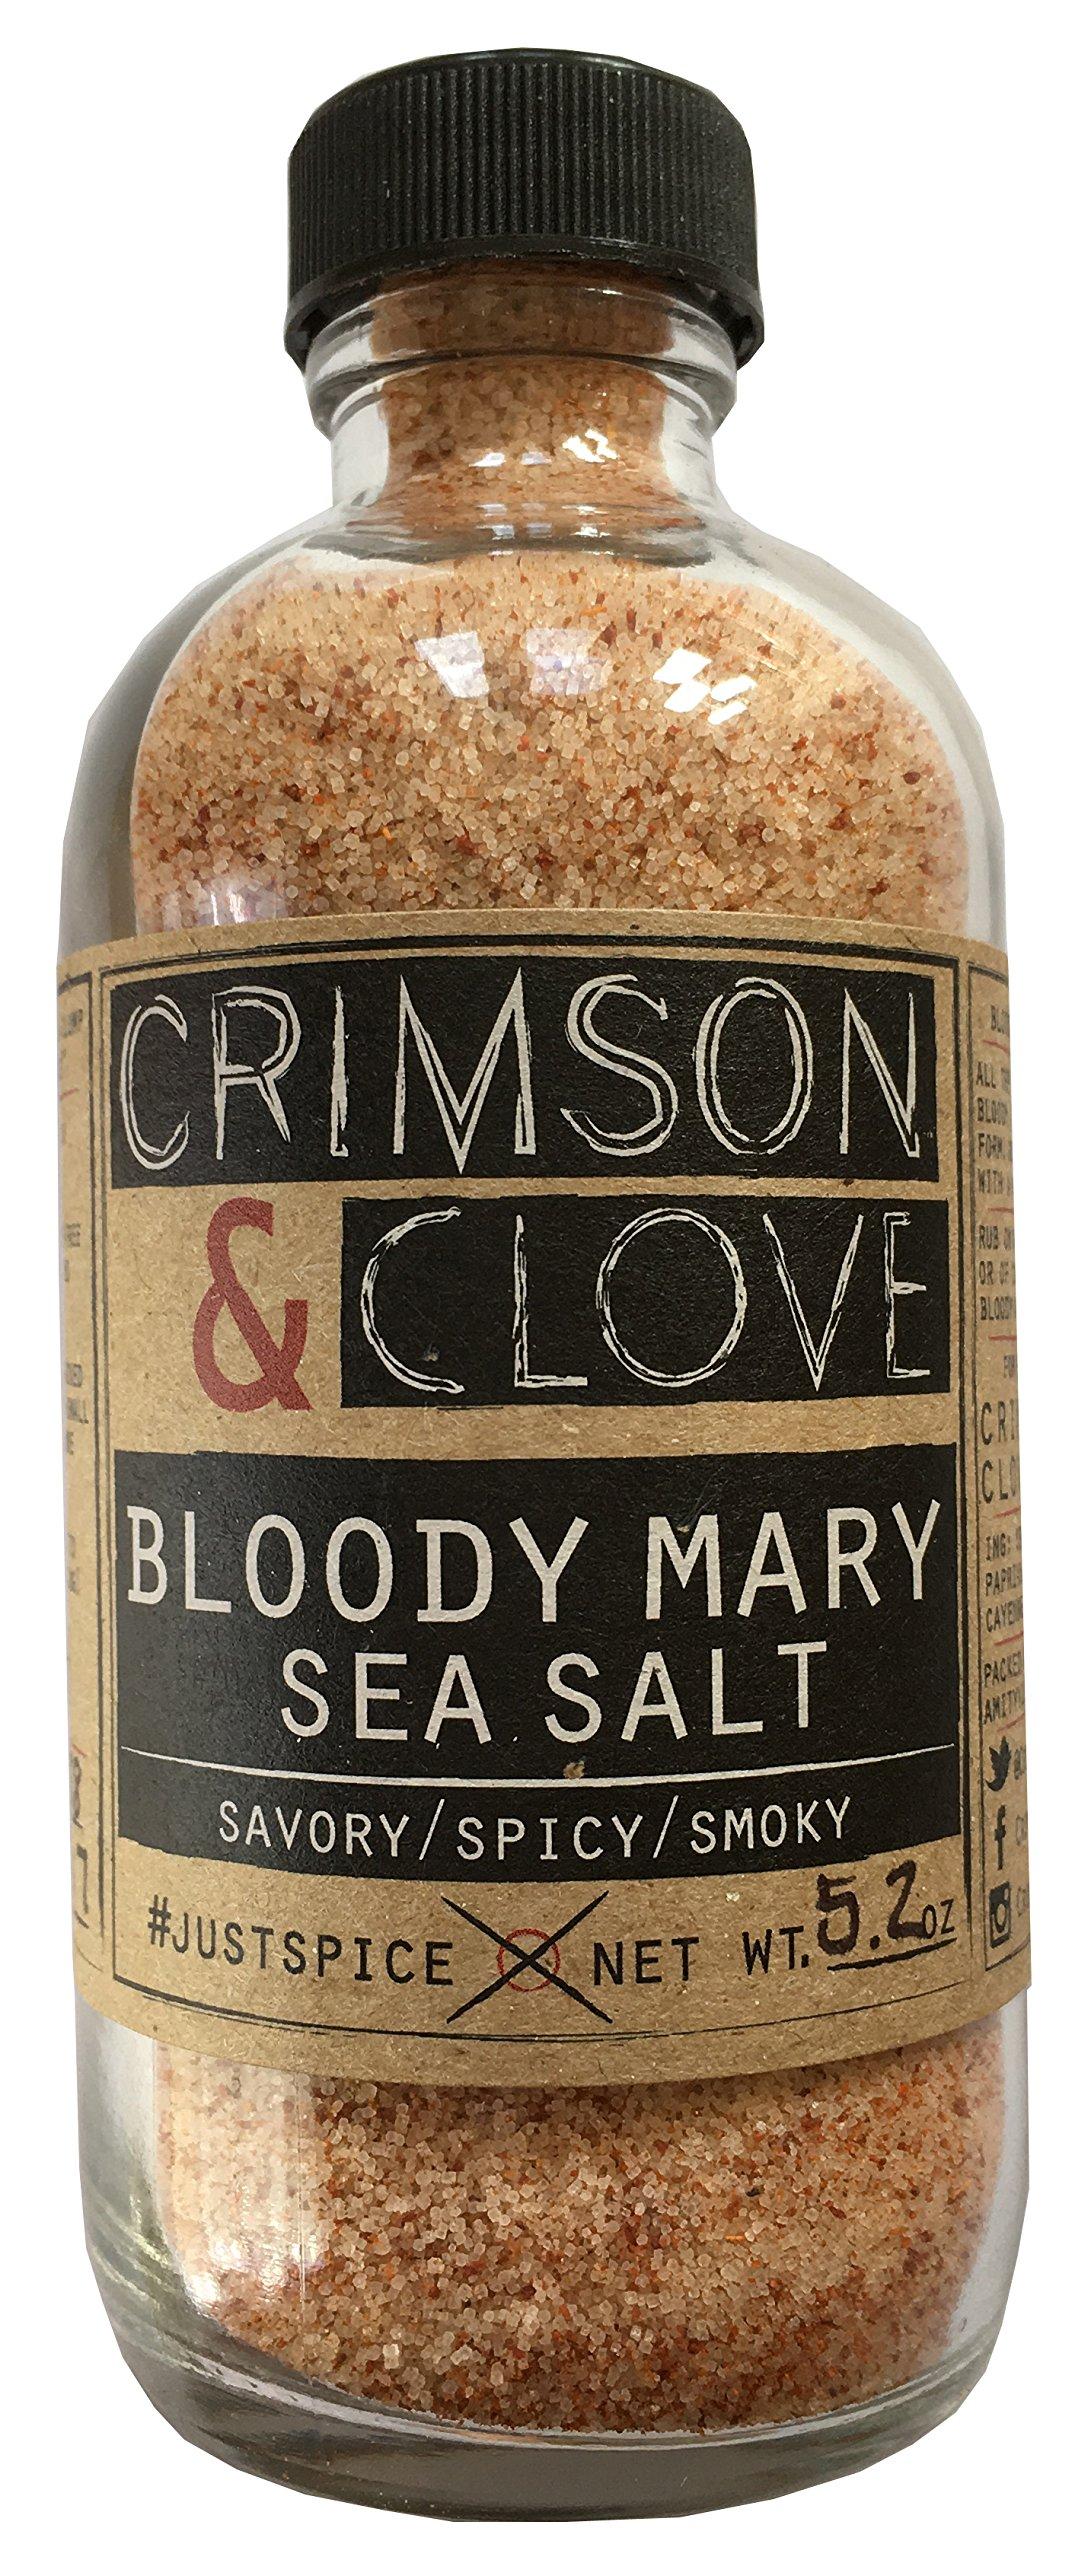 Bloody Mary Rim Salt by Crimson and Clove (5.2 oz.)